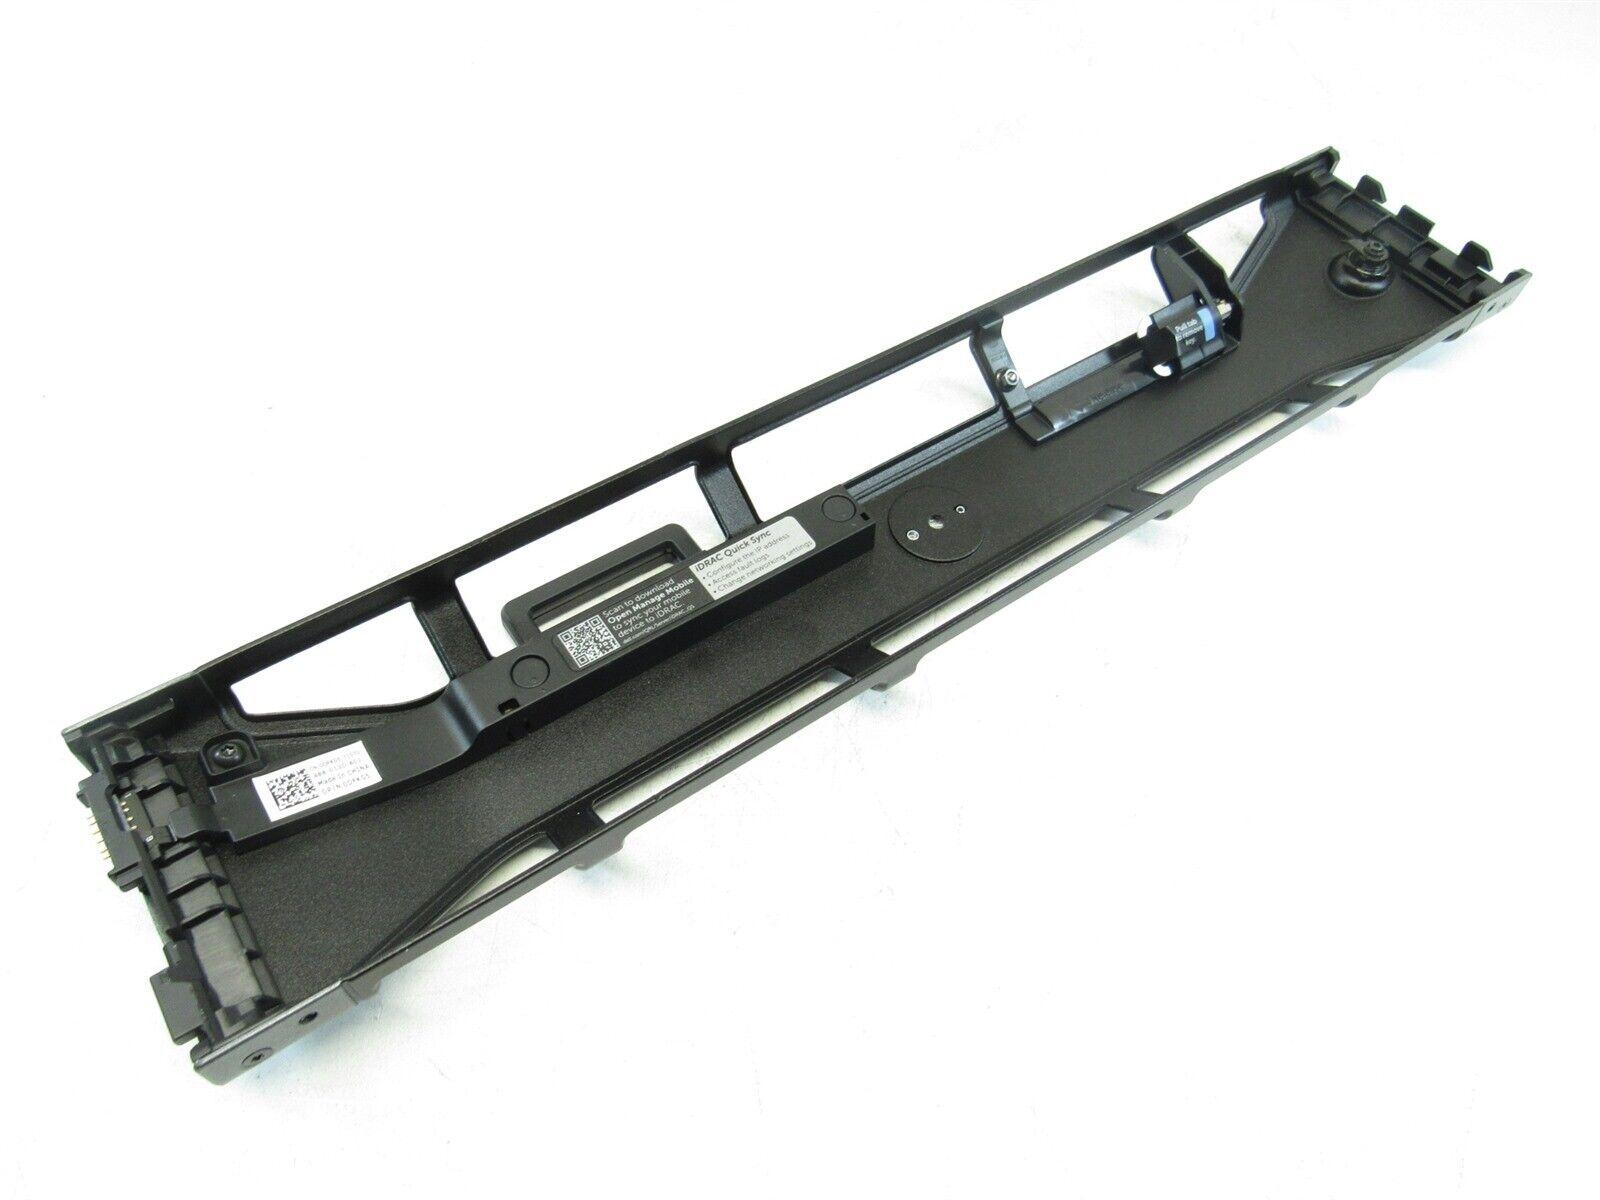 Dell Dfkg5 iDRAC Quick Sync Security Bezel for POWEREDGE R730